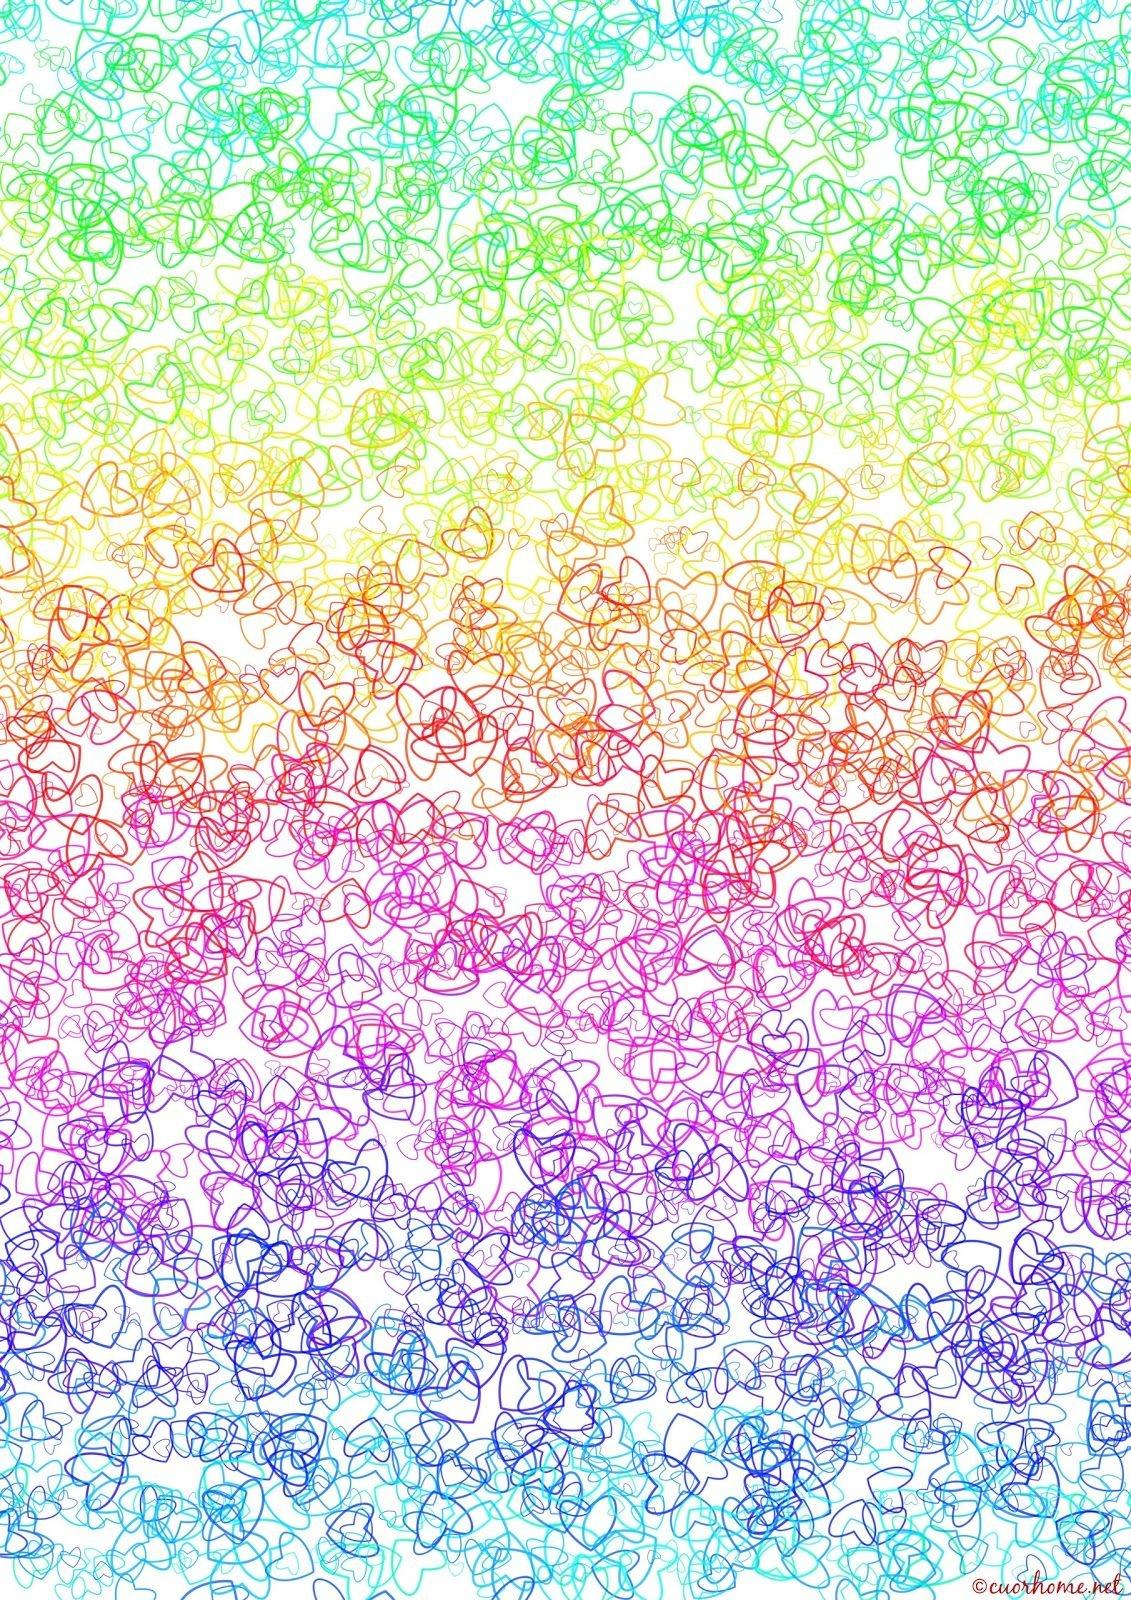 Printable Backgrounds Free - Kaza.psstech.co - Free Printable Backgrounds